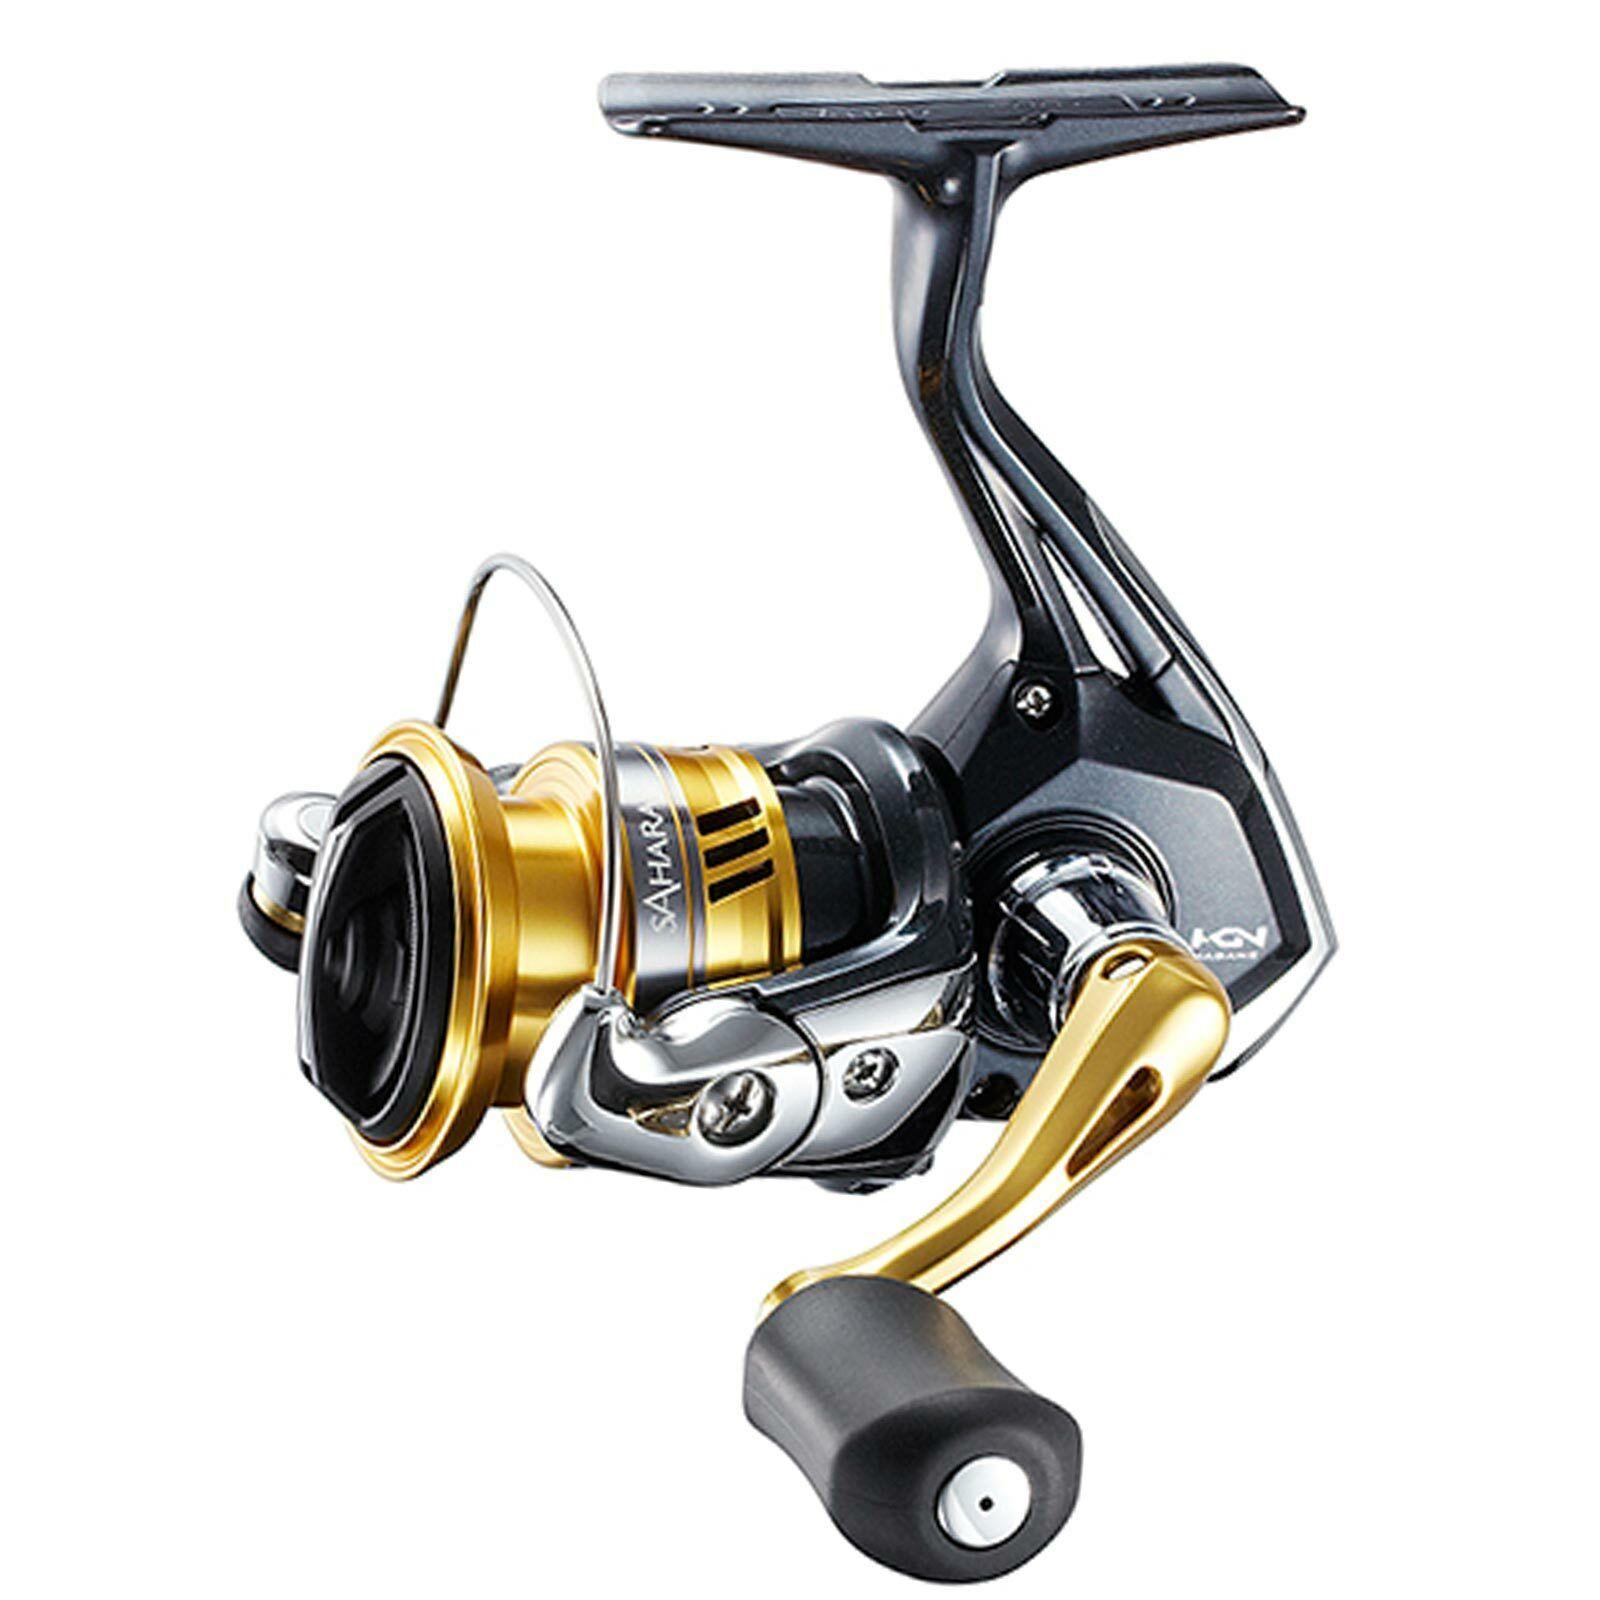 Shihommeo Fishing Reel Stationary role-Sahara Fi 500 Fi